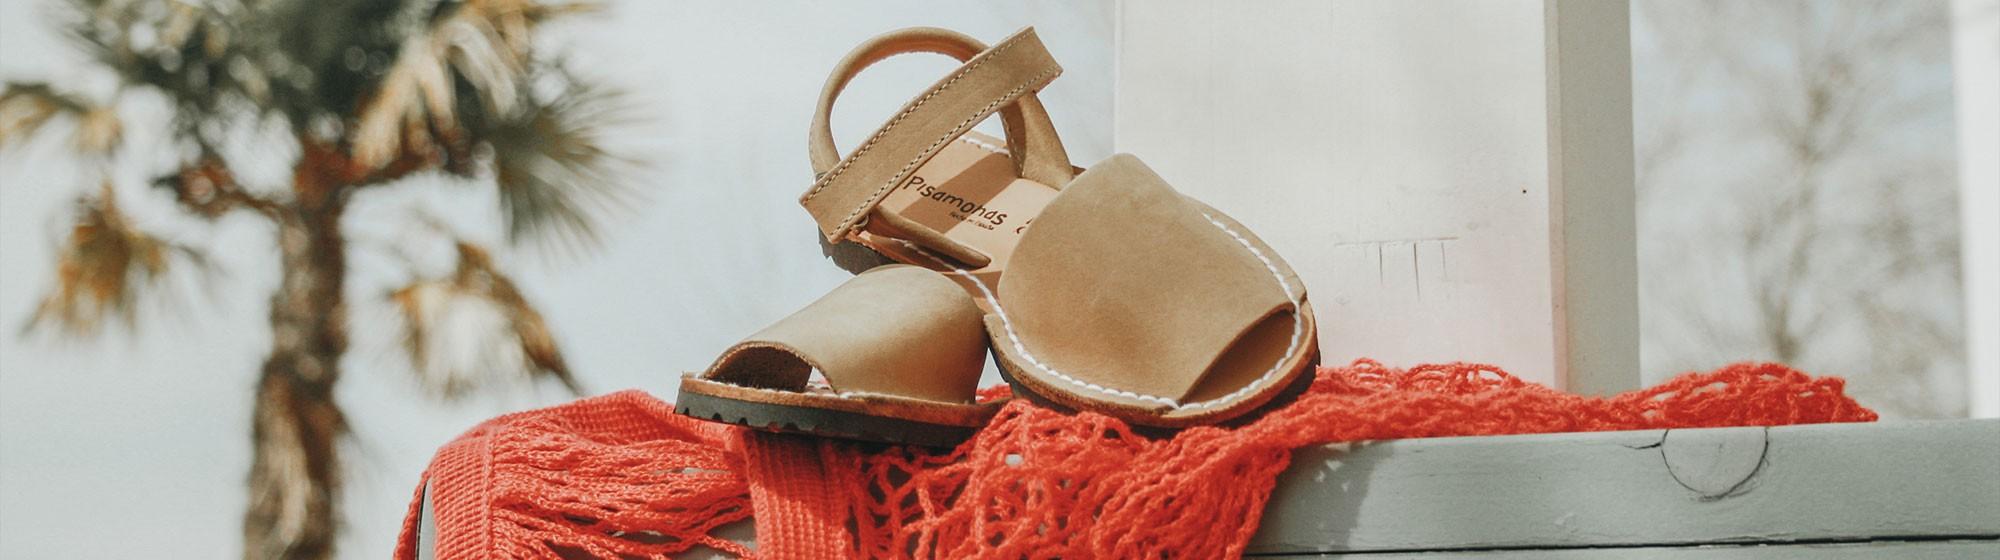 Sandales Avarcas